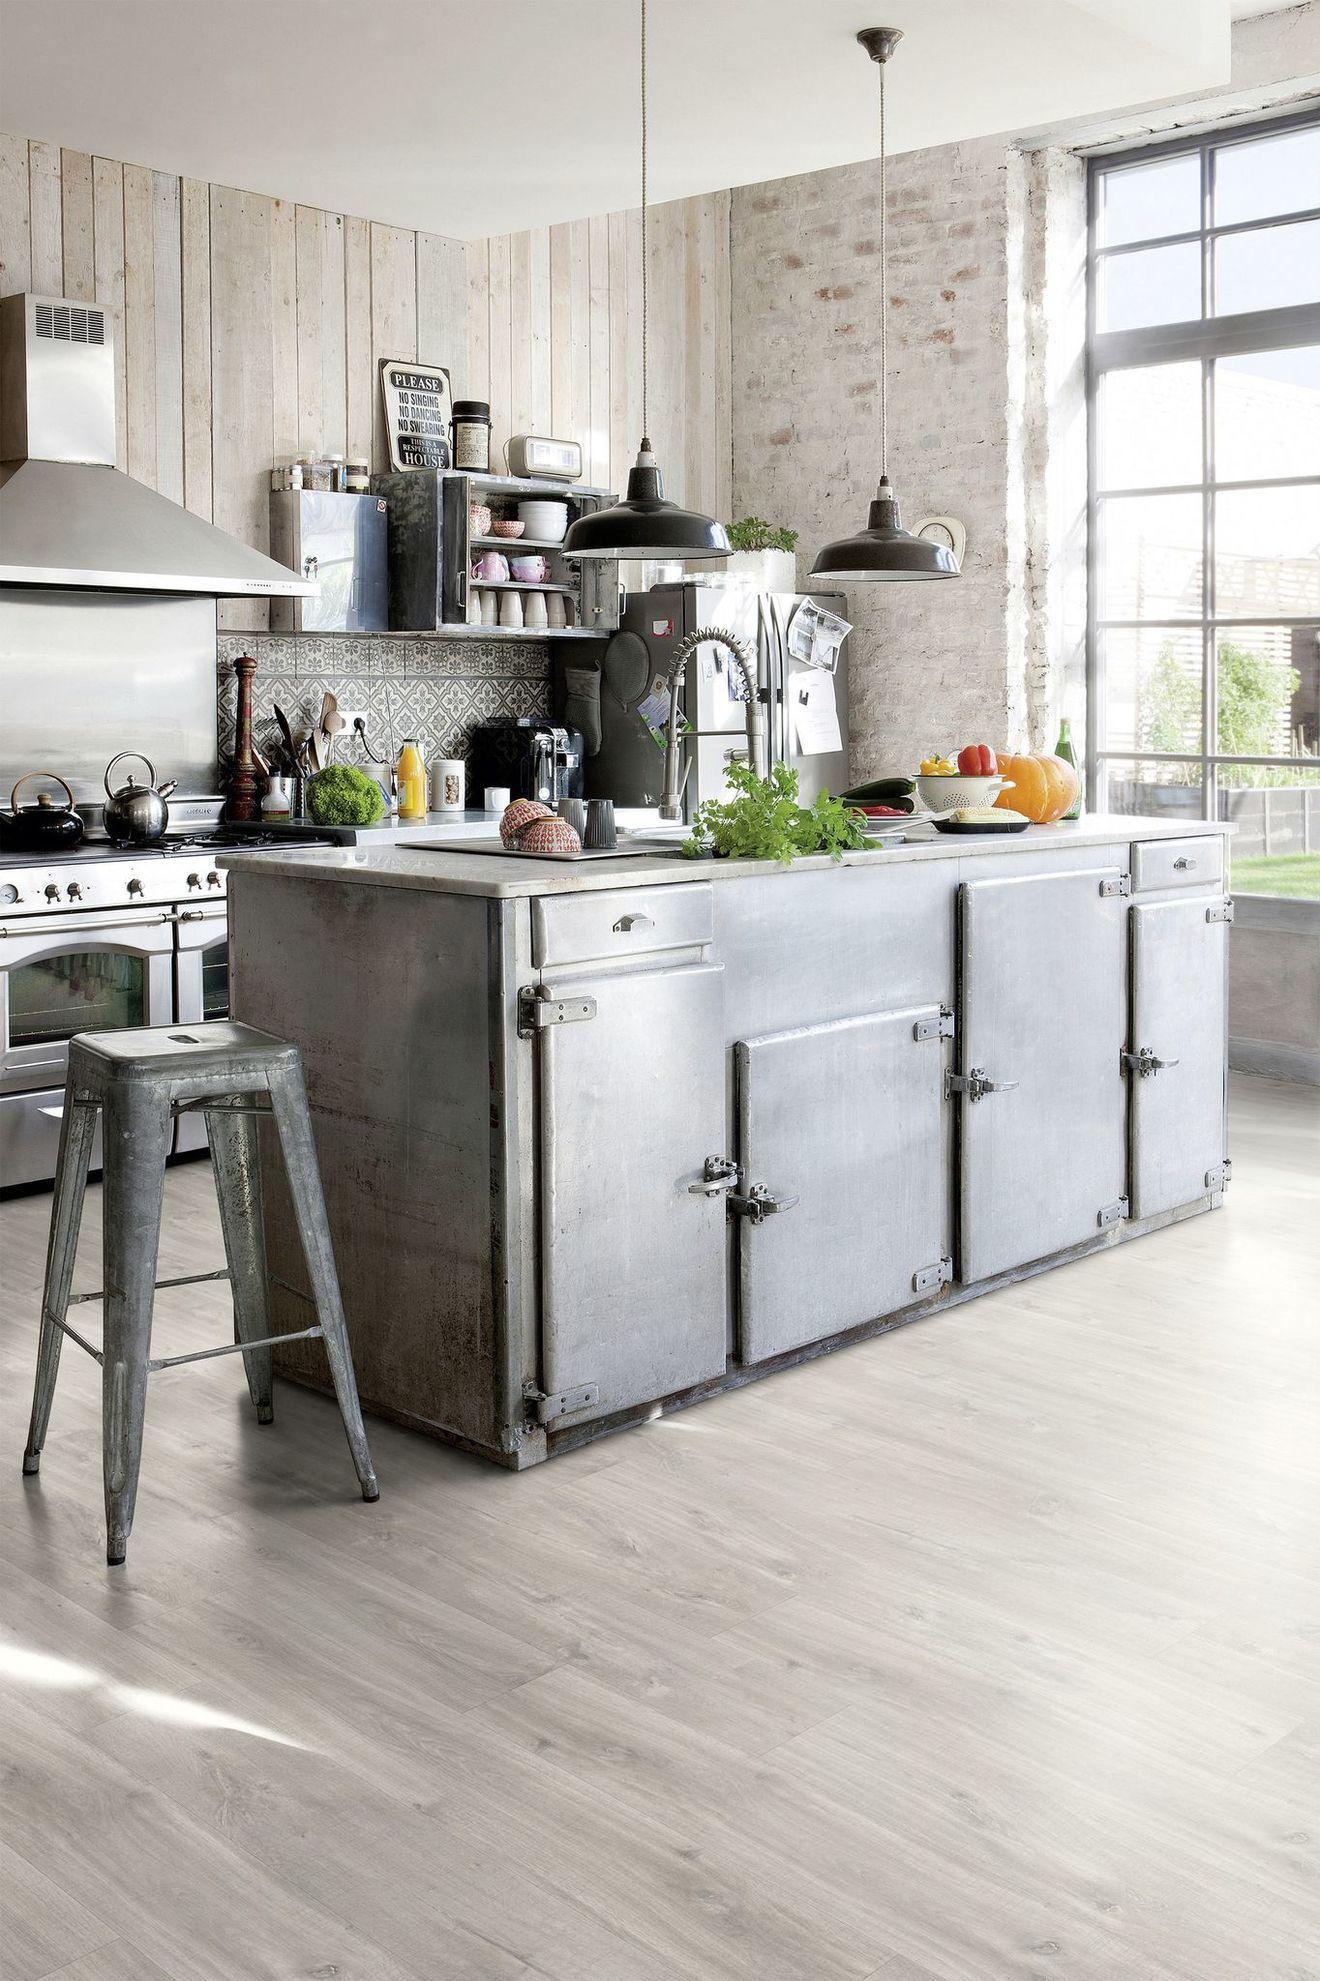 sol vinyle imitation parquet kitchens sol vinyle sol. Black Bedroom Furniture Sets. Home Design Ideas